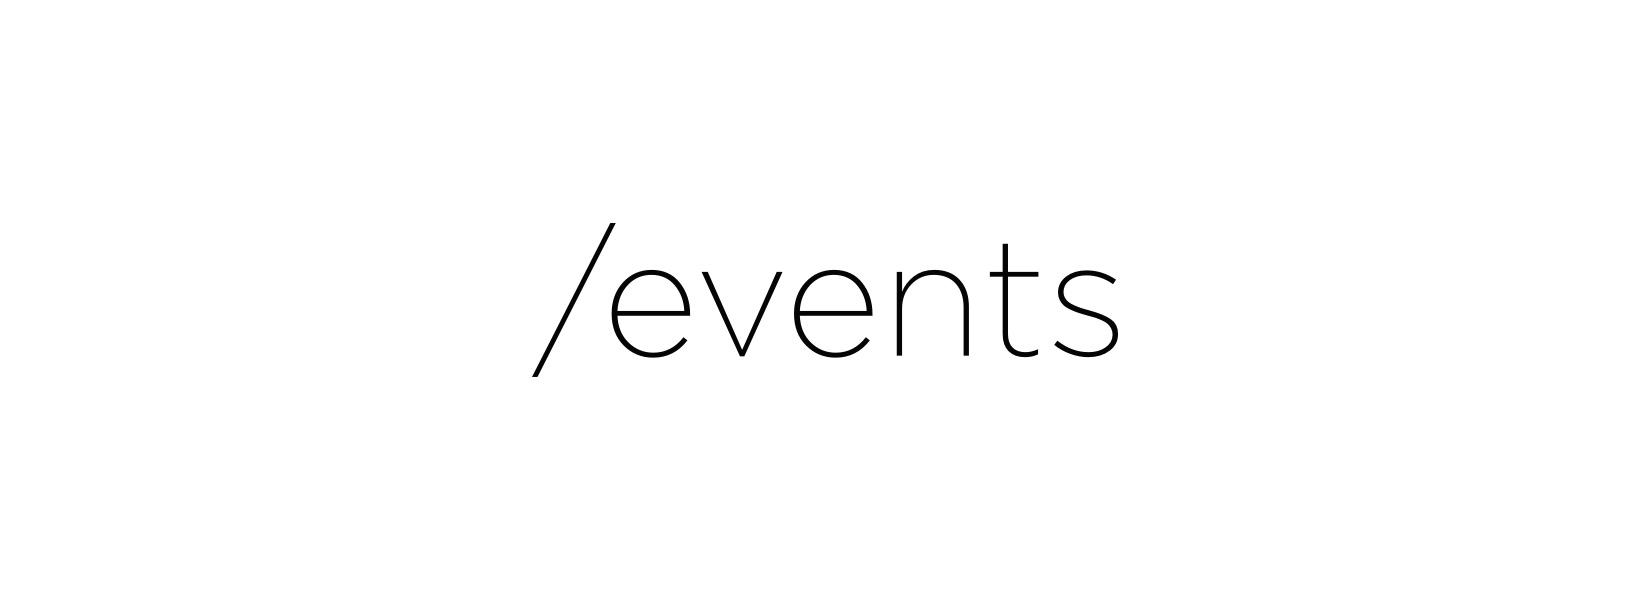 Announcing Skcript Events